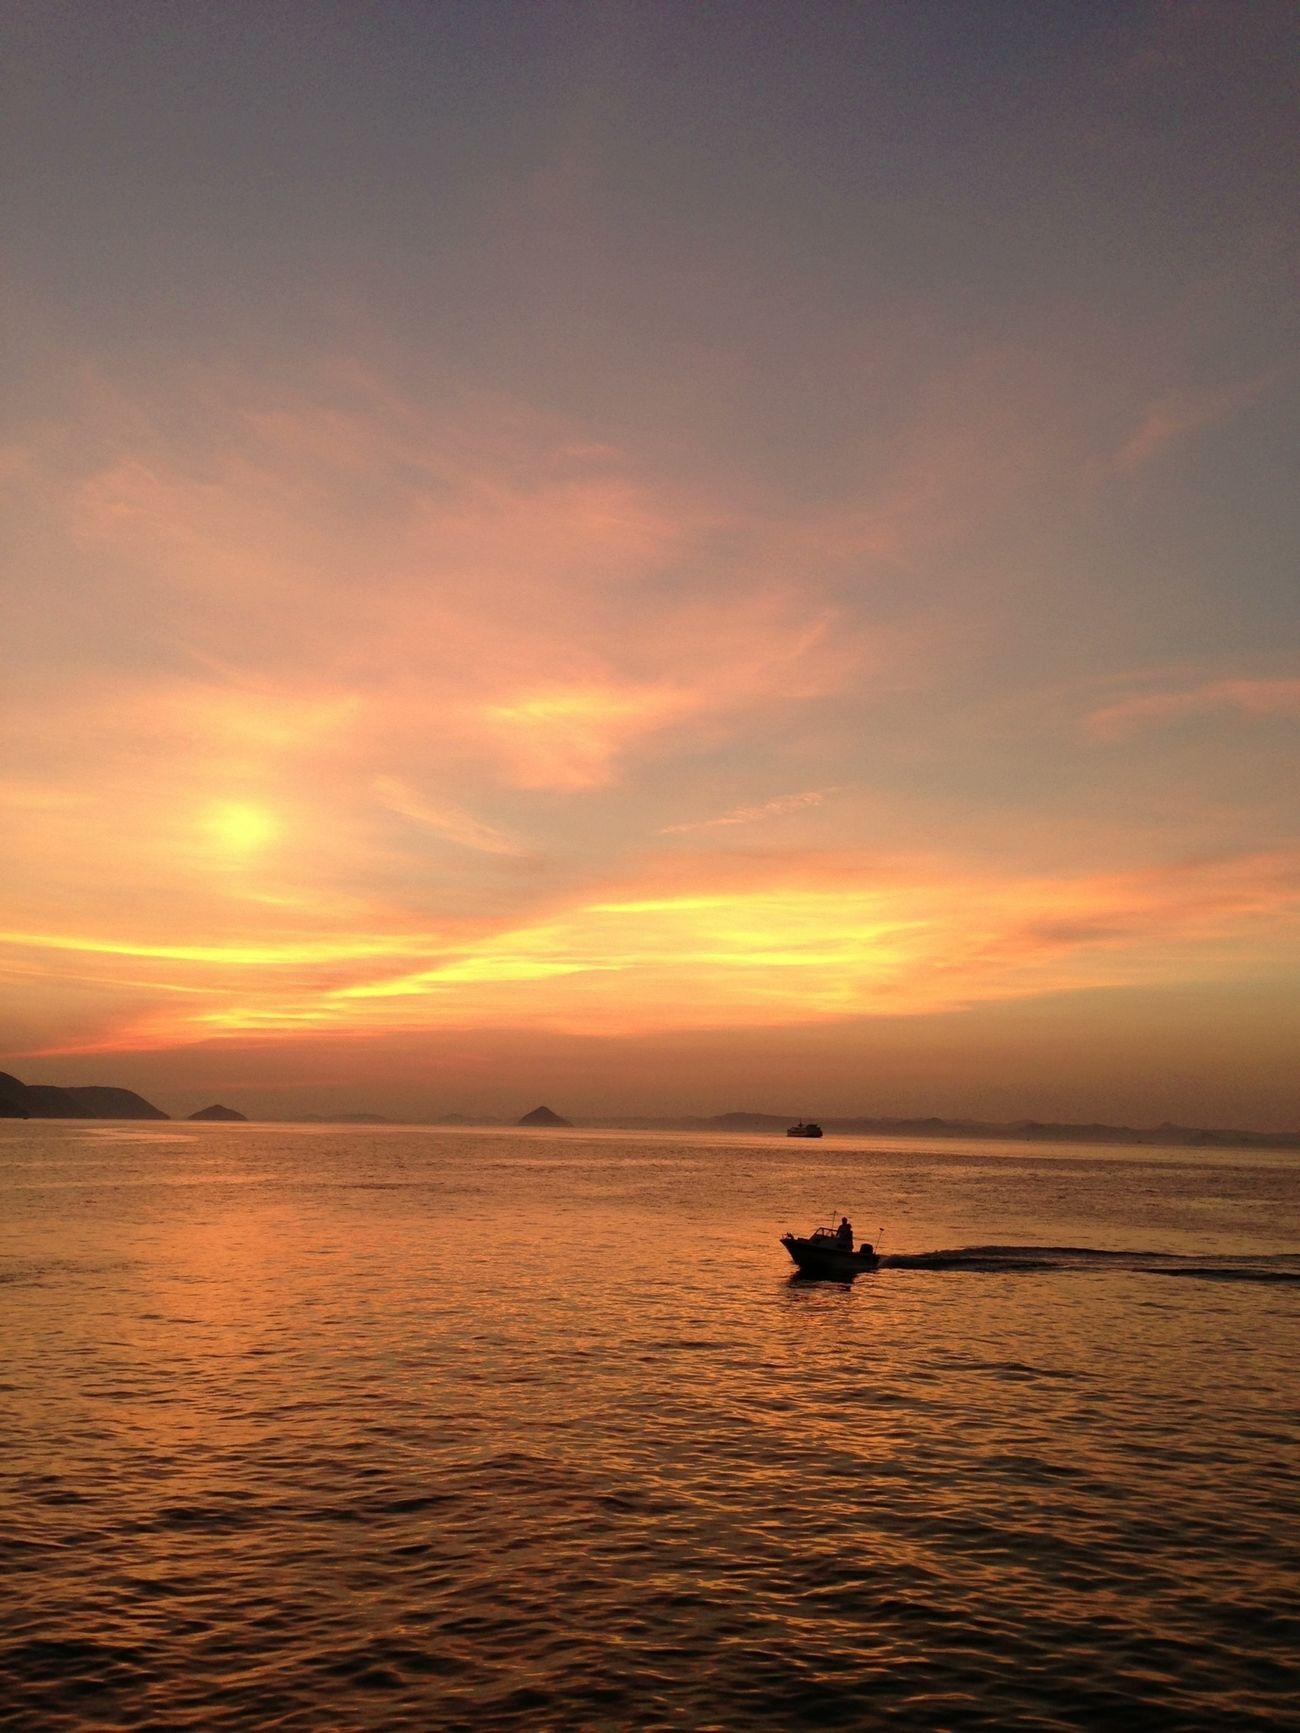 Sun_collection EyeEm Best Shots Photography Sky